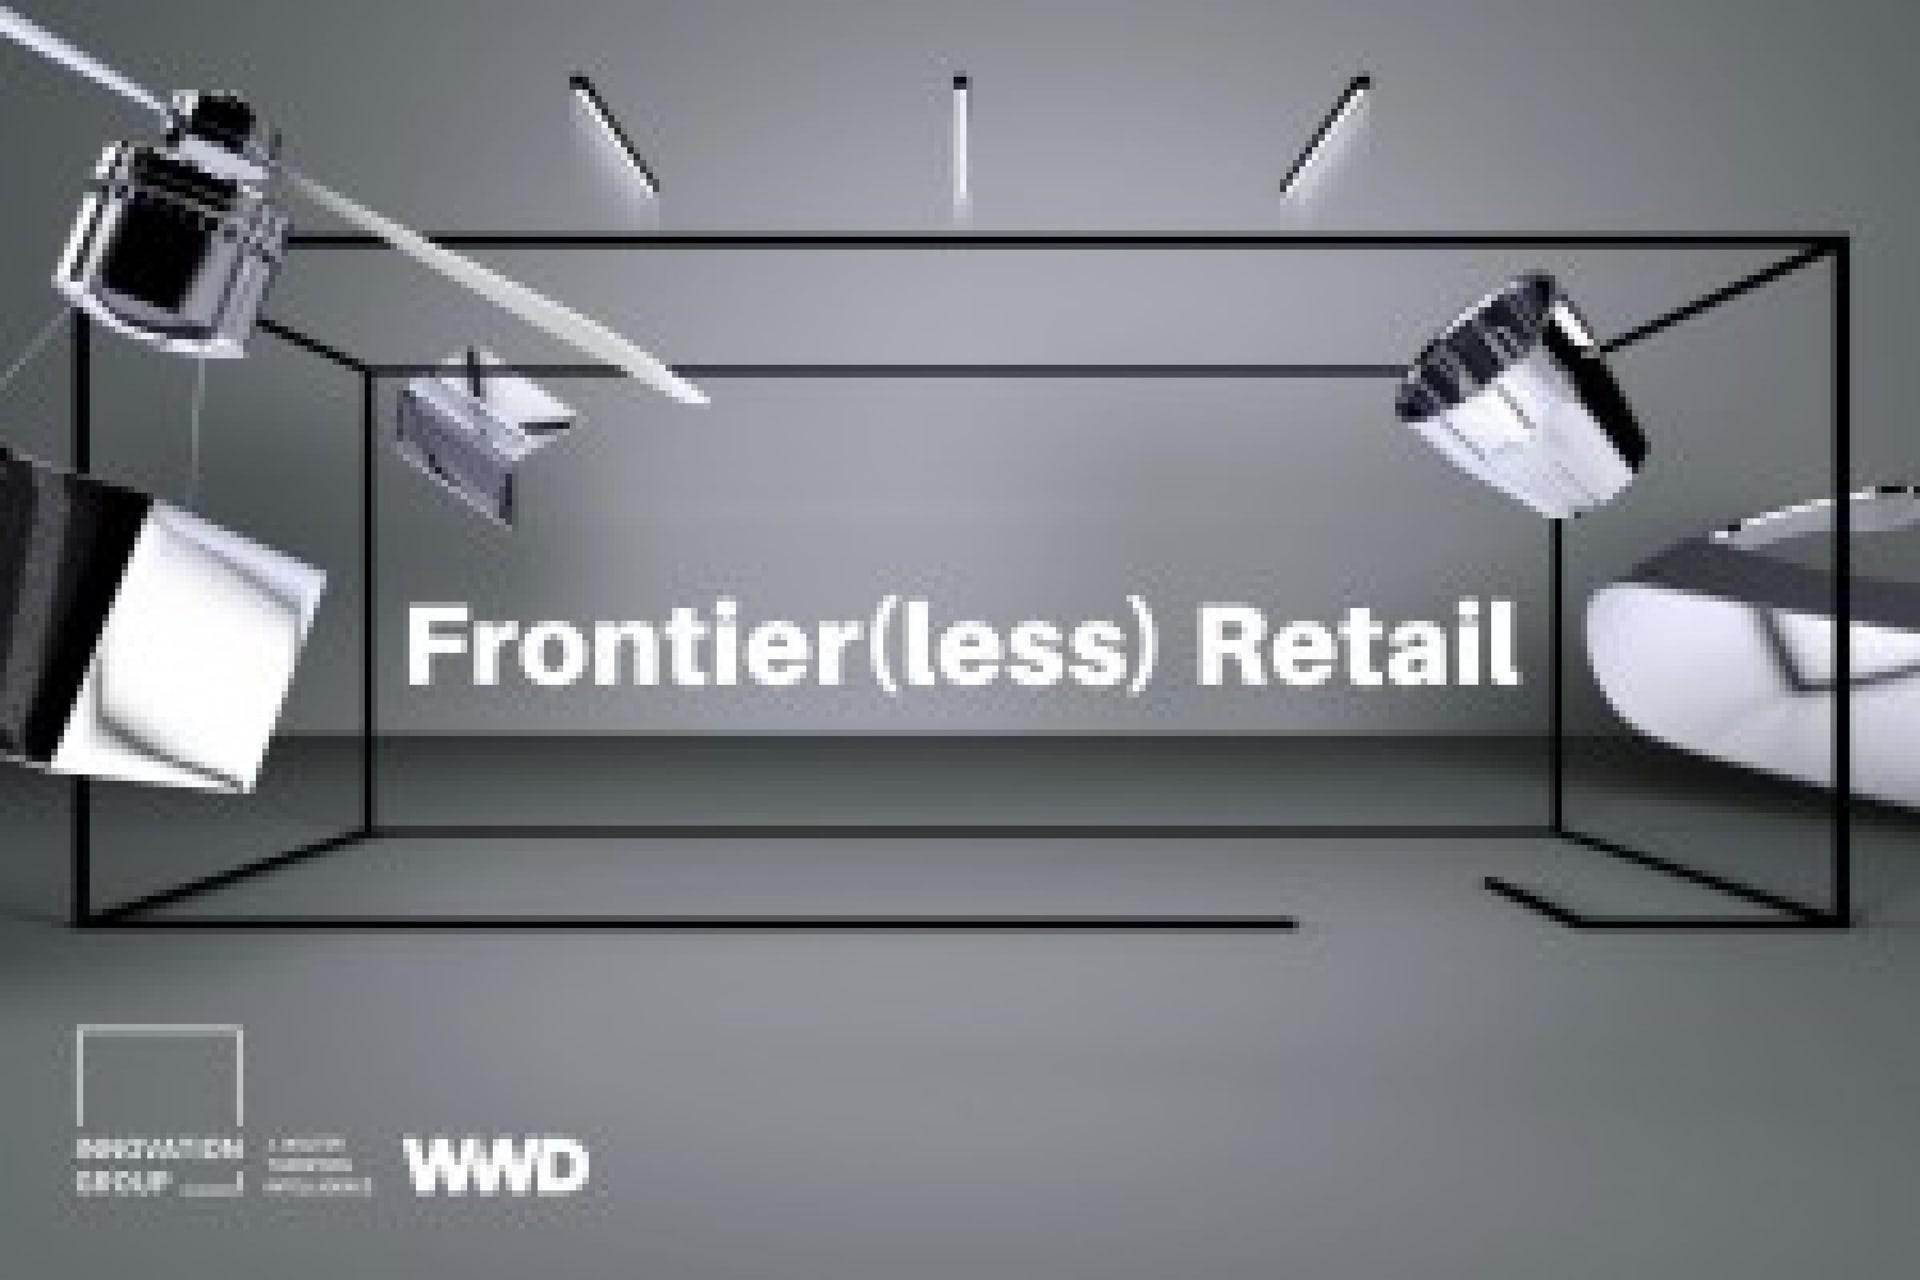 Frontierless Retail 300x200